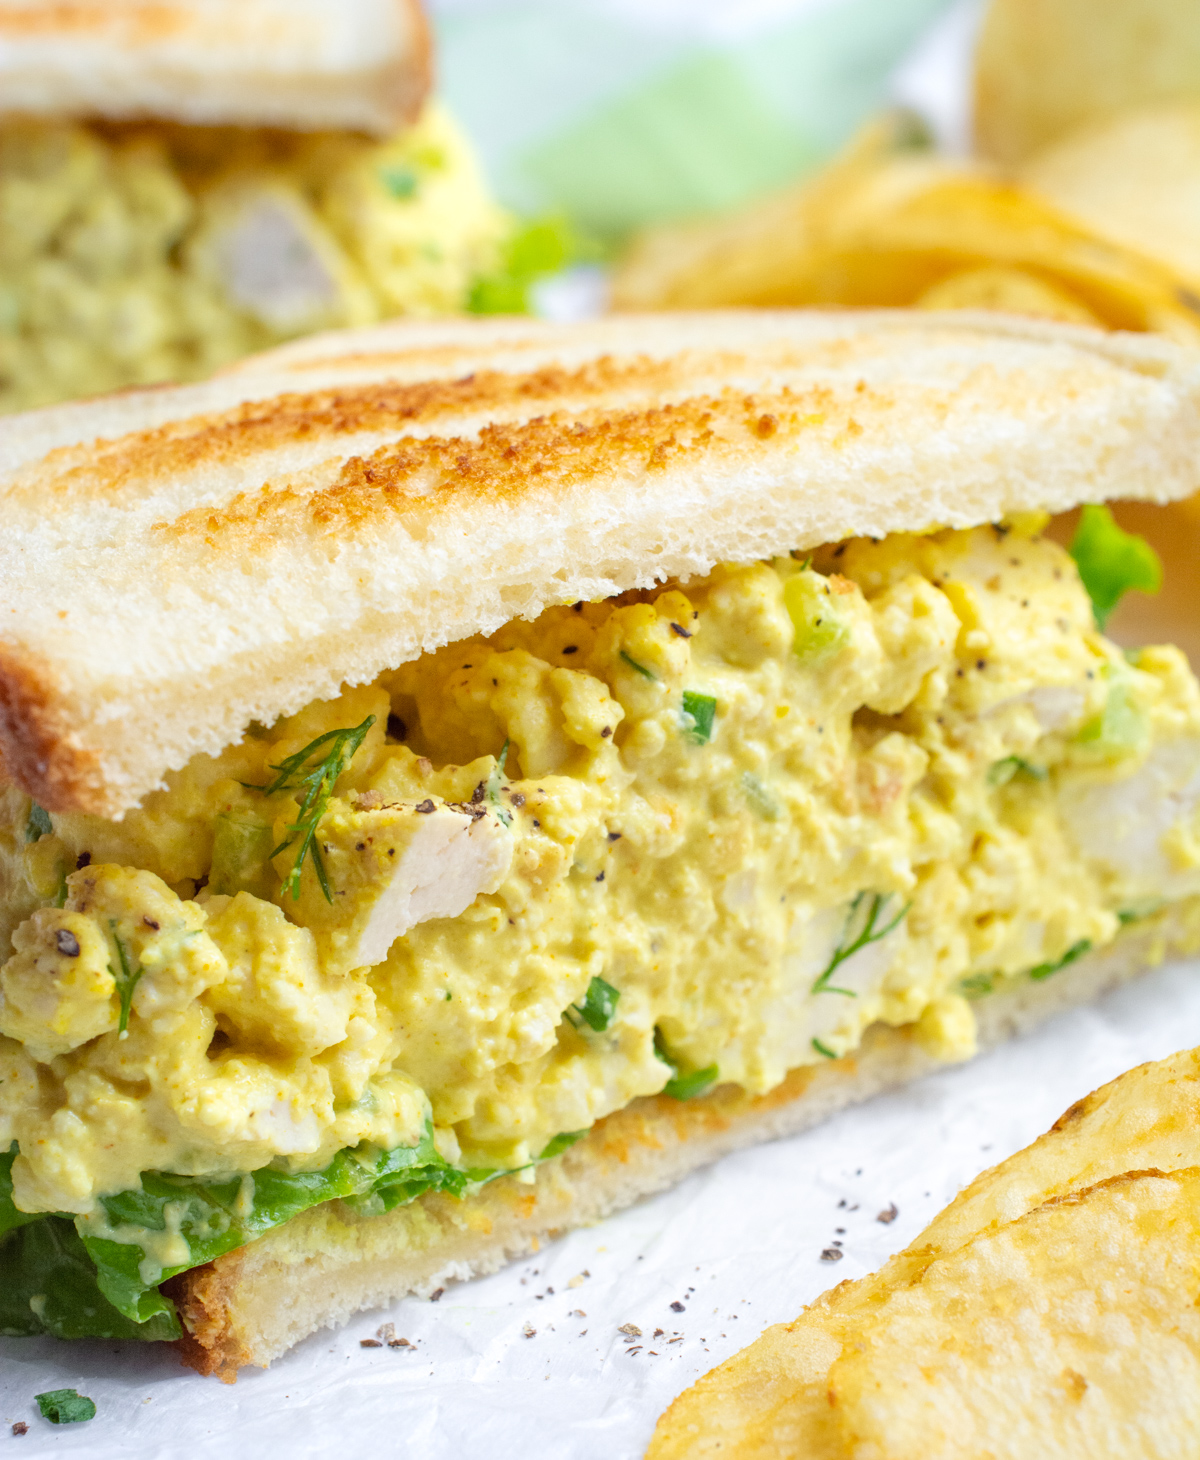 Half of a vegan egg salad sandwich.